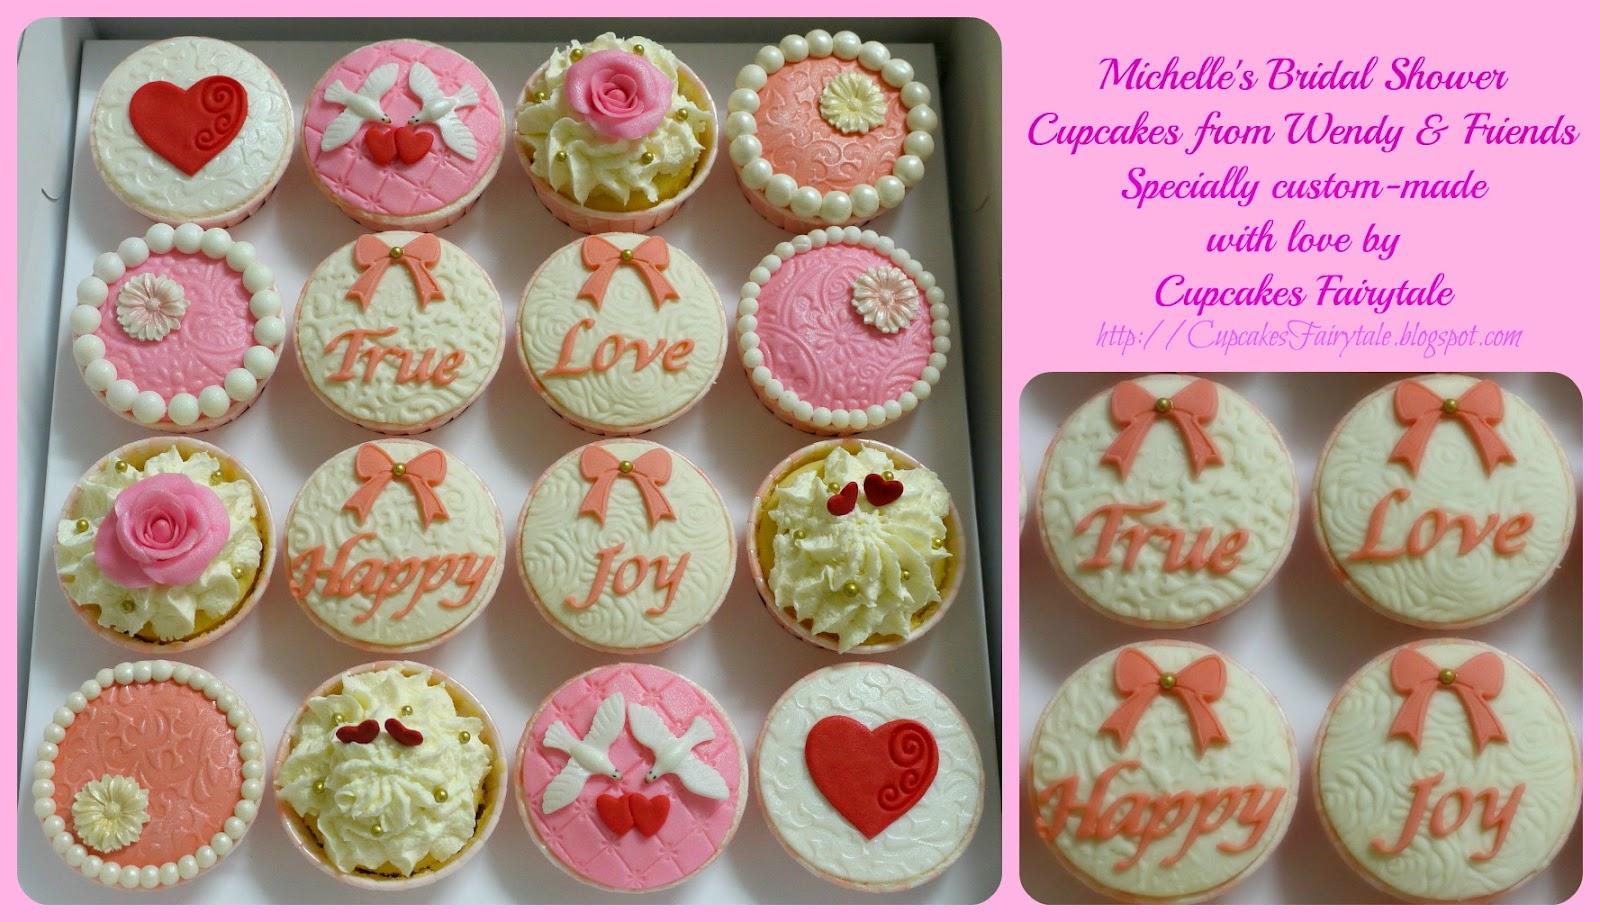 53bb708b9b4 Cupcakes Fairytale  MICHELLE S BRIDAL SHOWER CUPCAKES